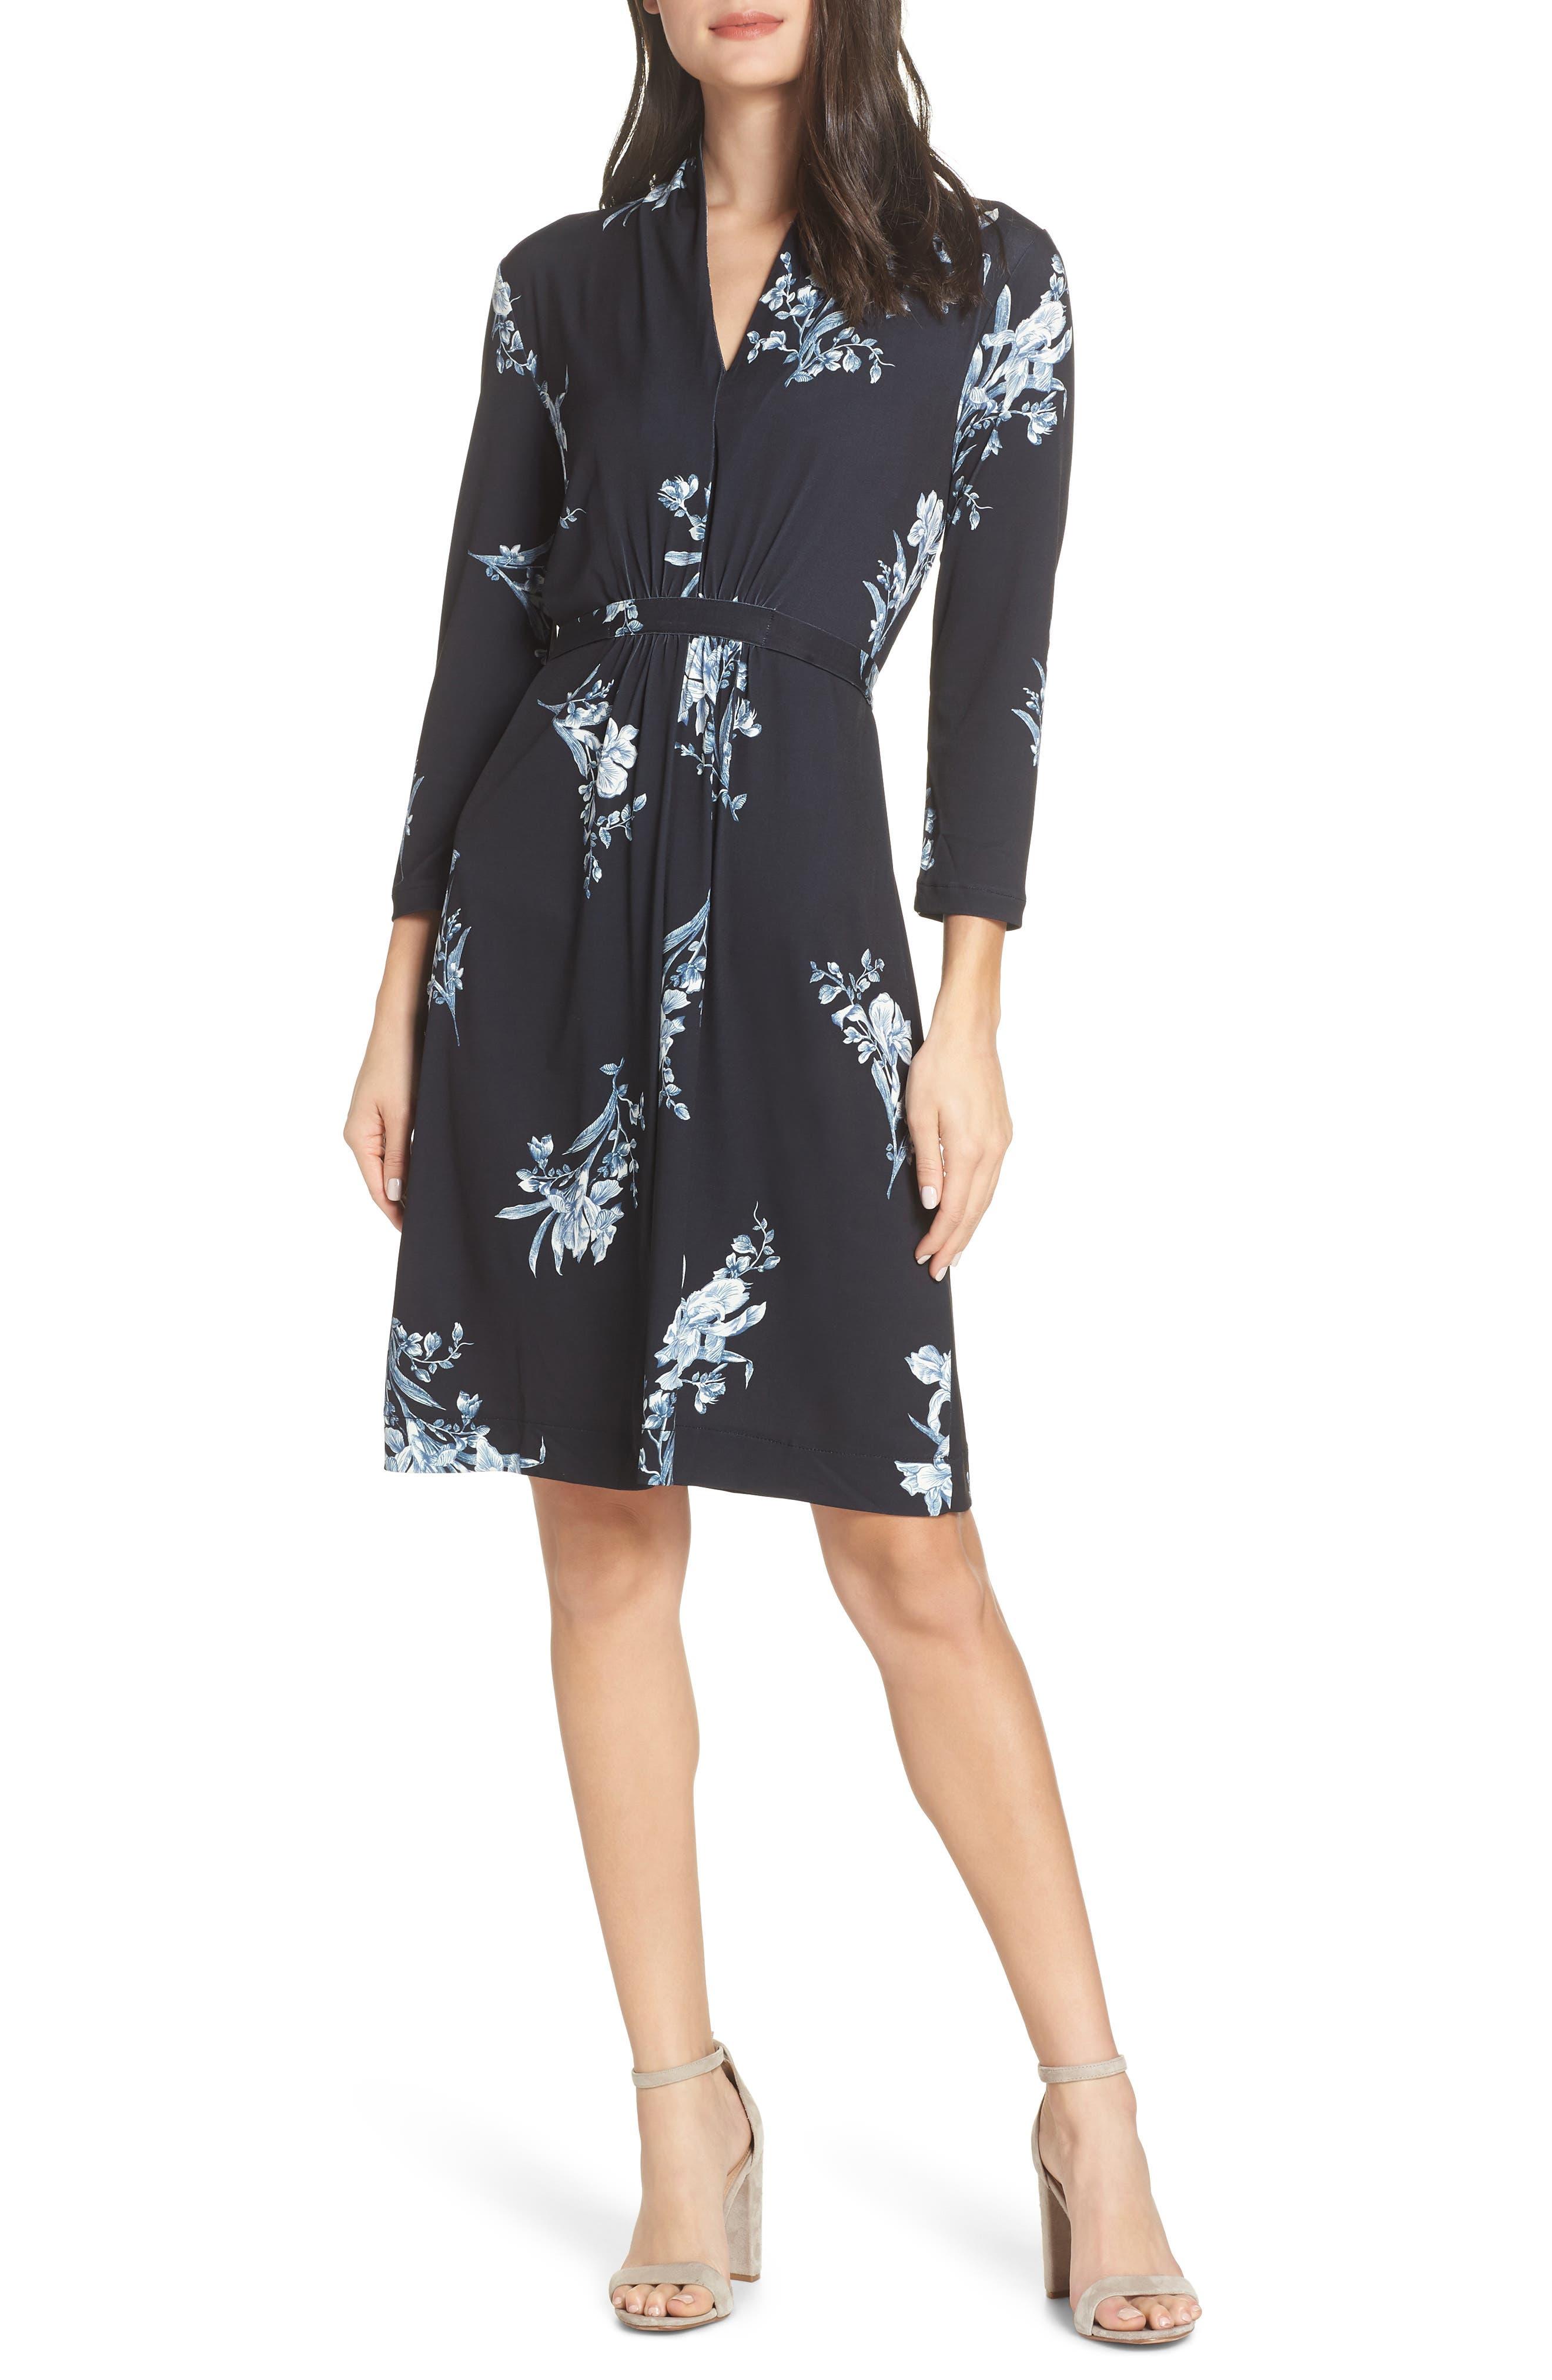 FRENCH CONNECTION Laila Floral Print Dress, Main, color, BLACK MULTI